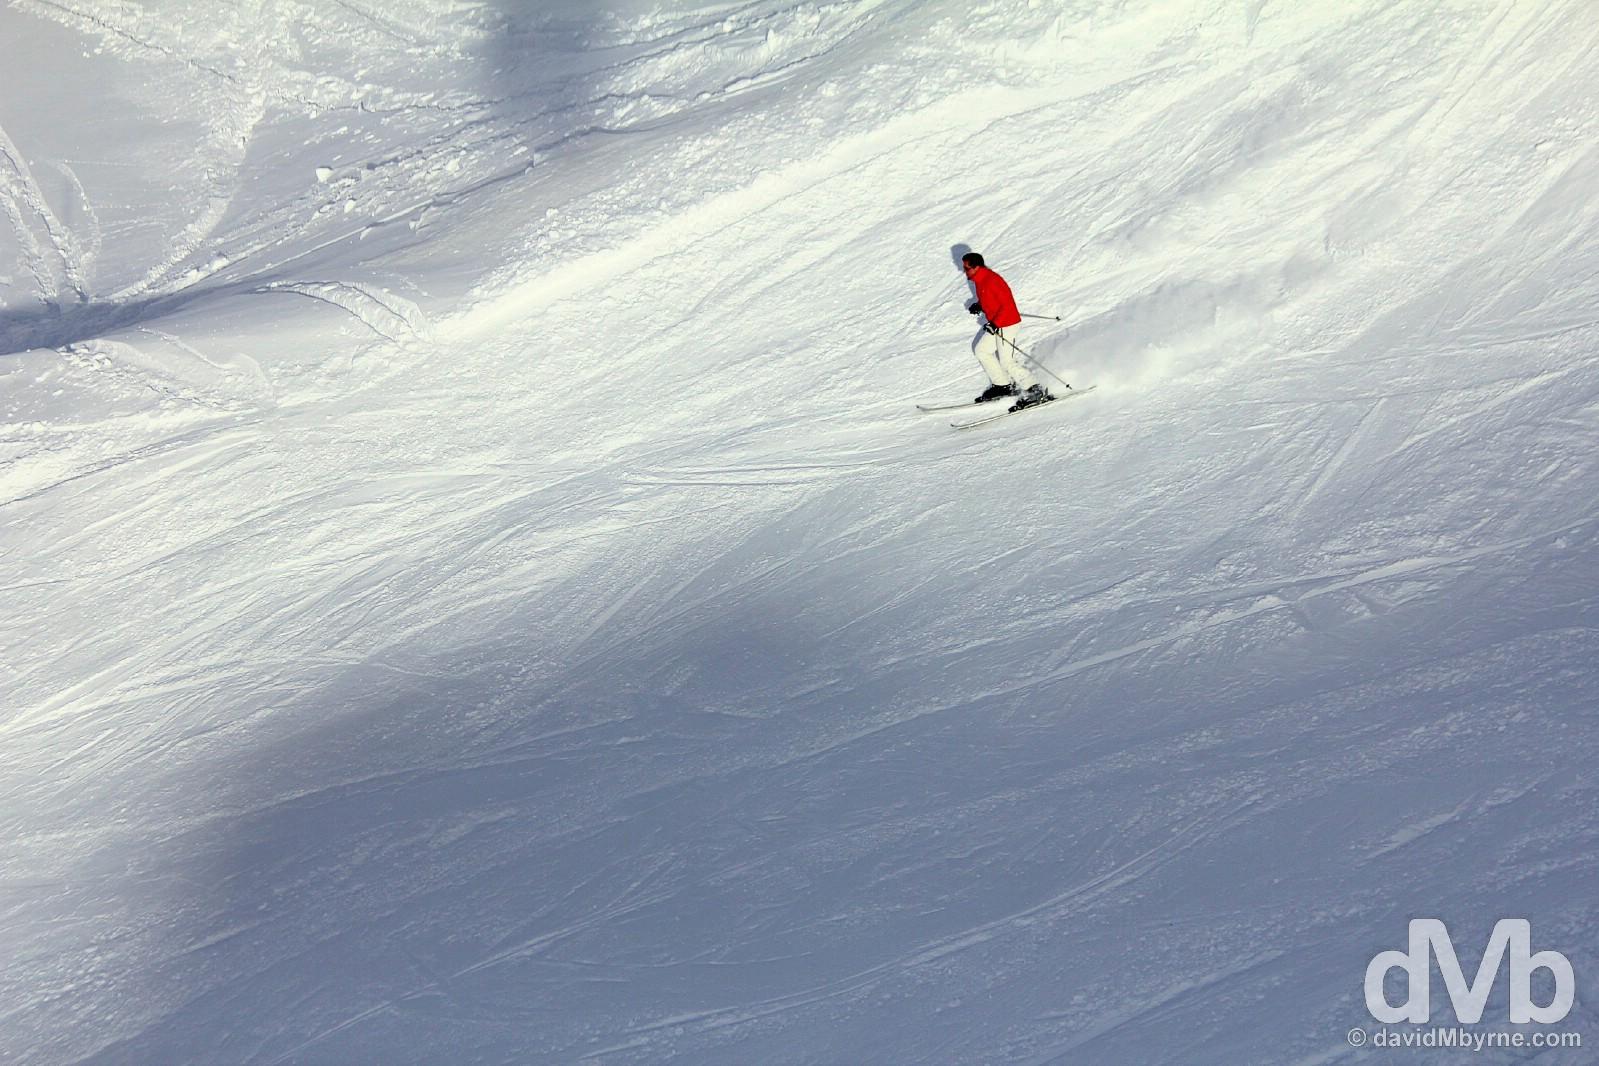 A skier on the slopes at the Shymbulak Ski Resort in the Zailiysky Alatau range in southern Kazakhstan. February 14, 2015.